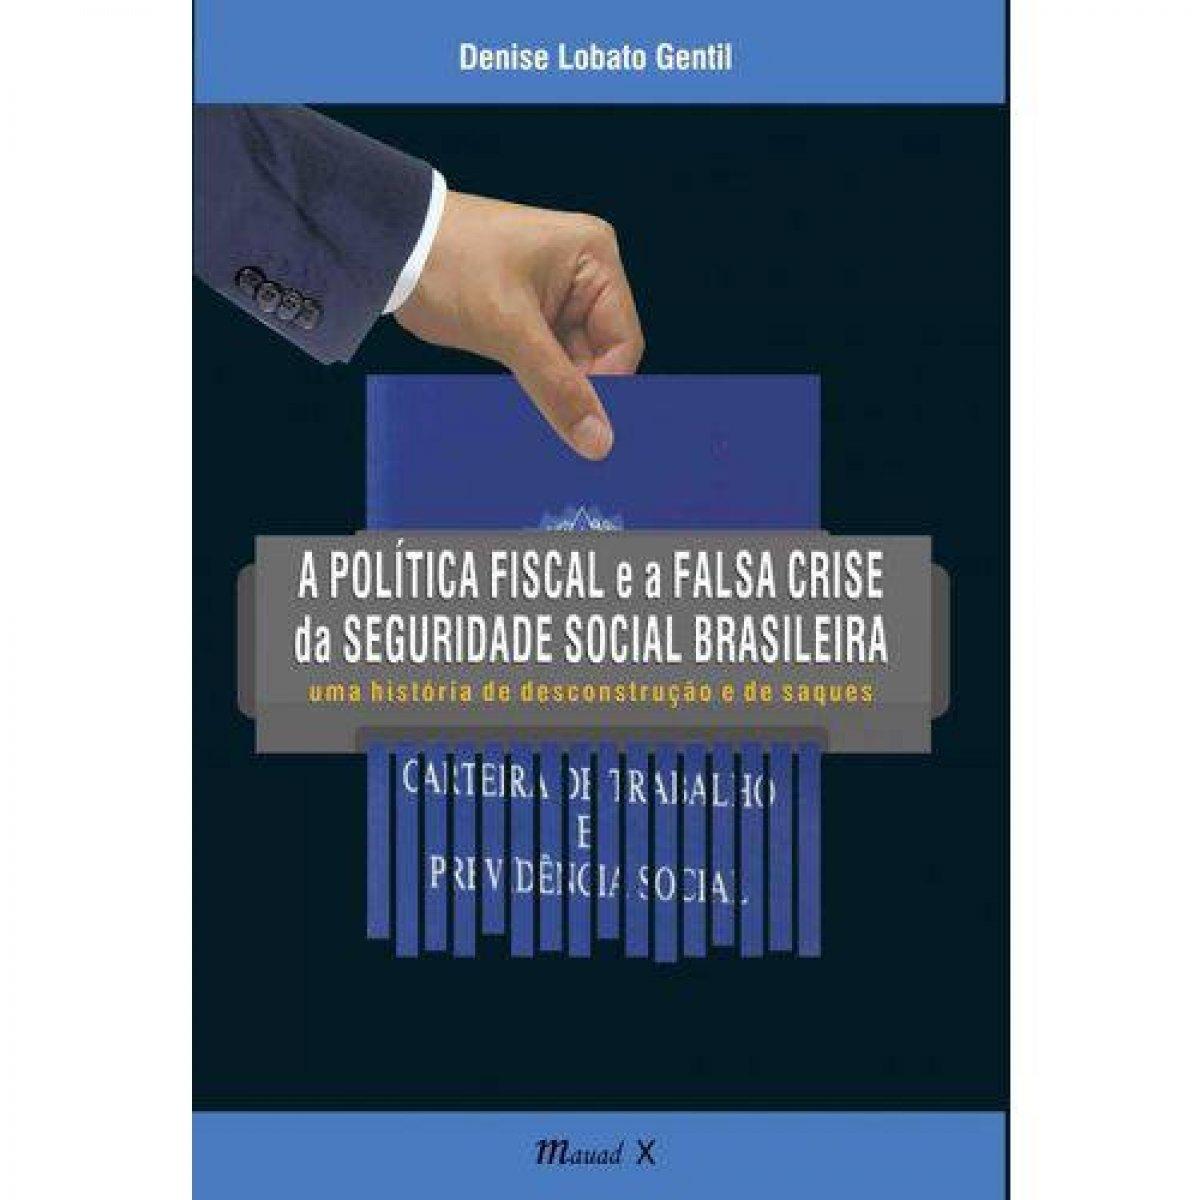 Economista de SC que mora na Paraíba ganha o Livro do Mês do Corecon - Corecon/SC